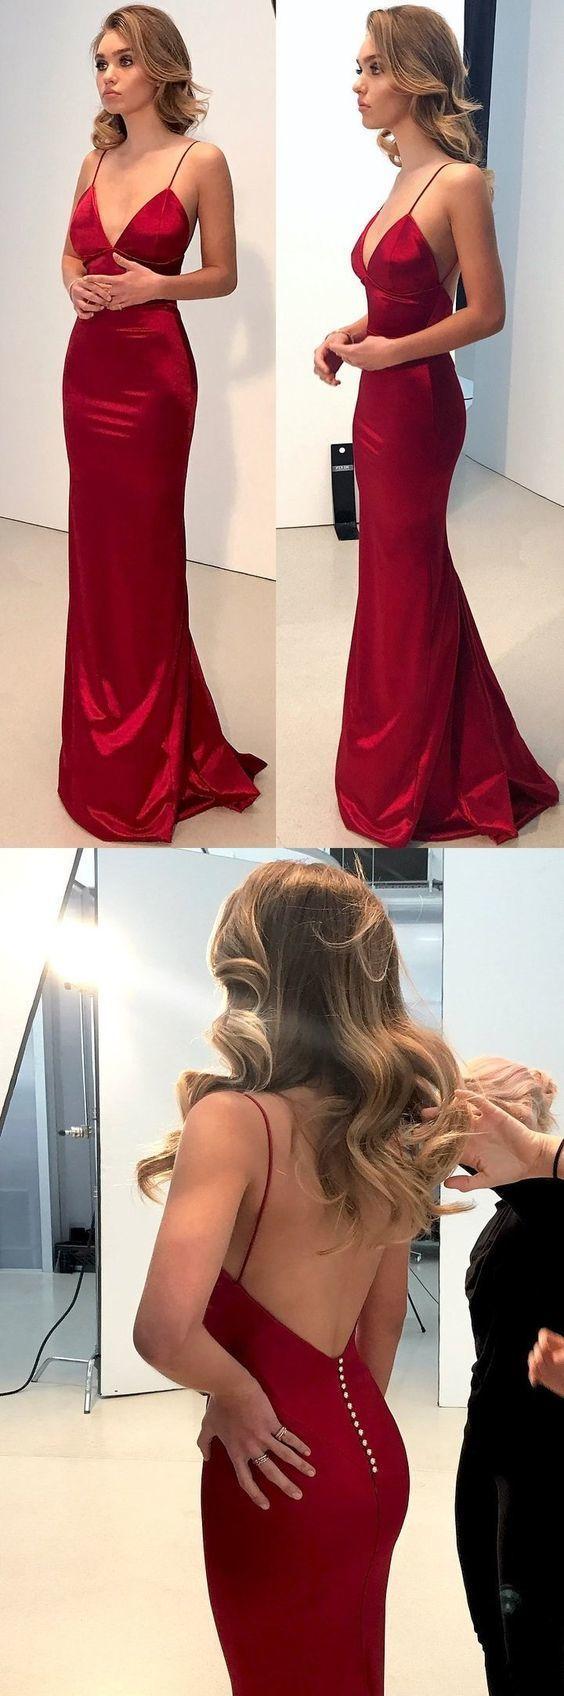 Discount sexy mermaid vneck spaghetti straps dark red prom dress